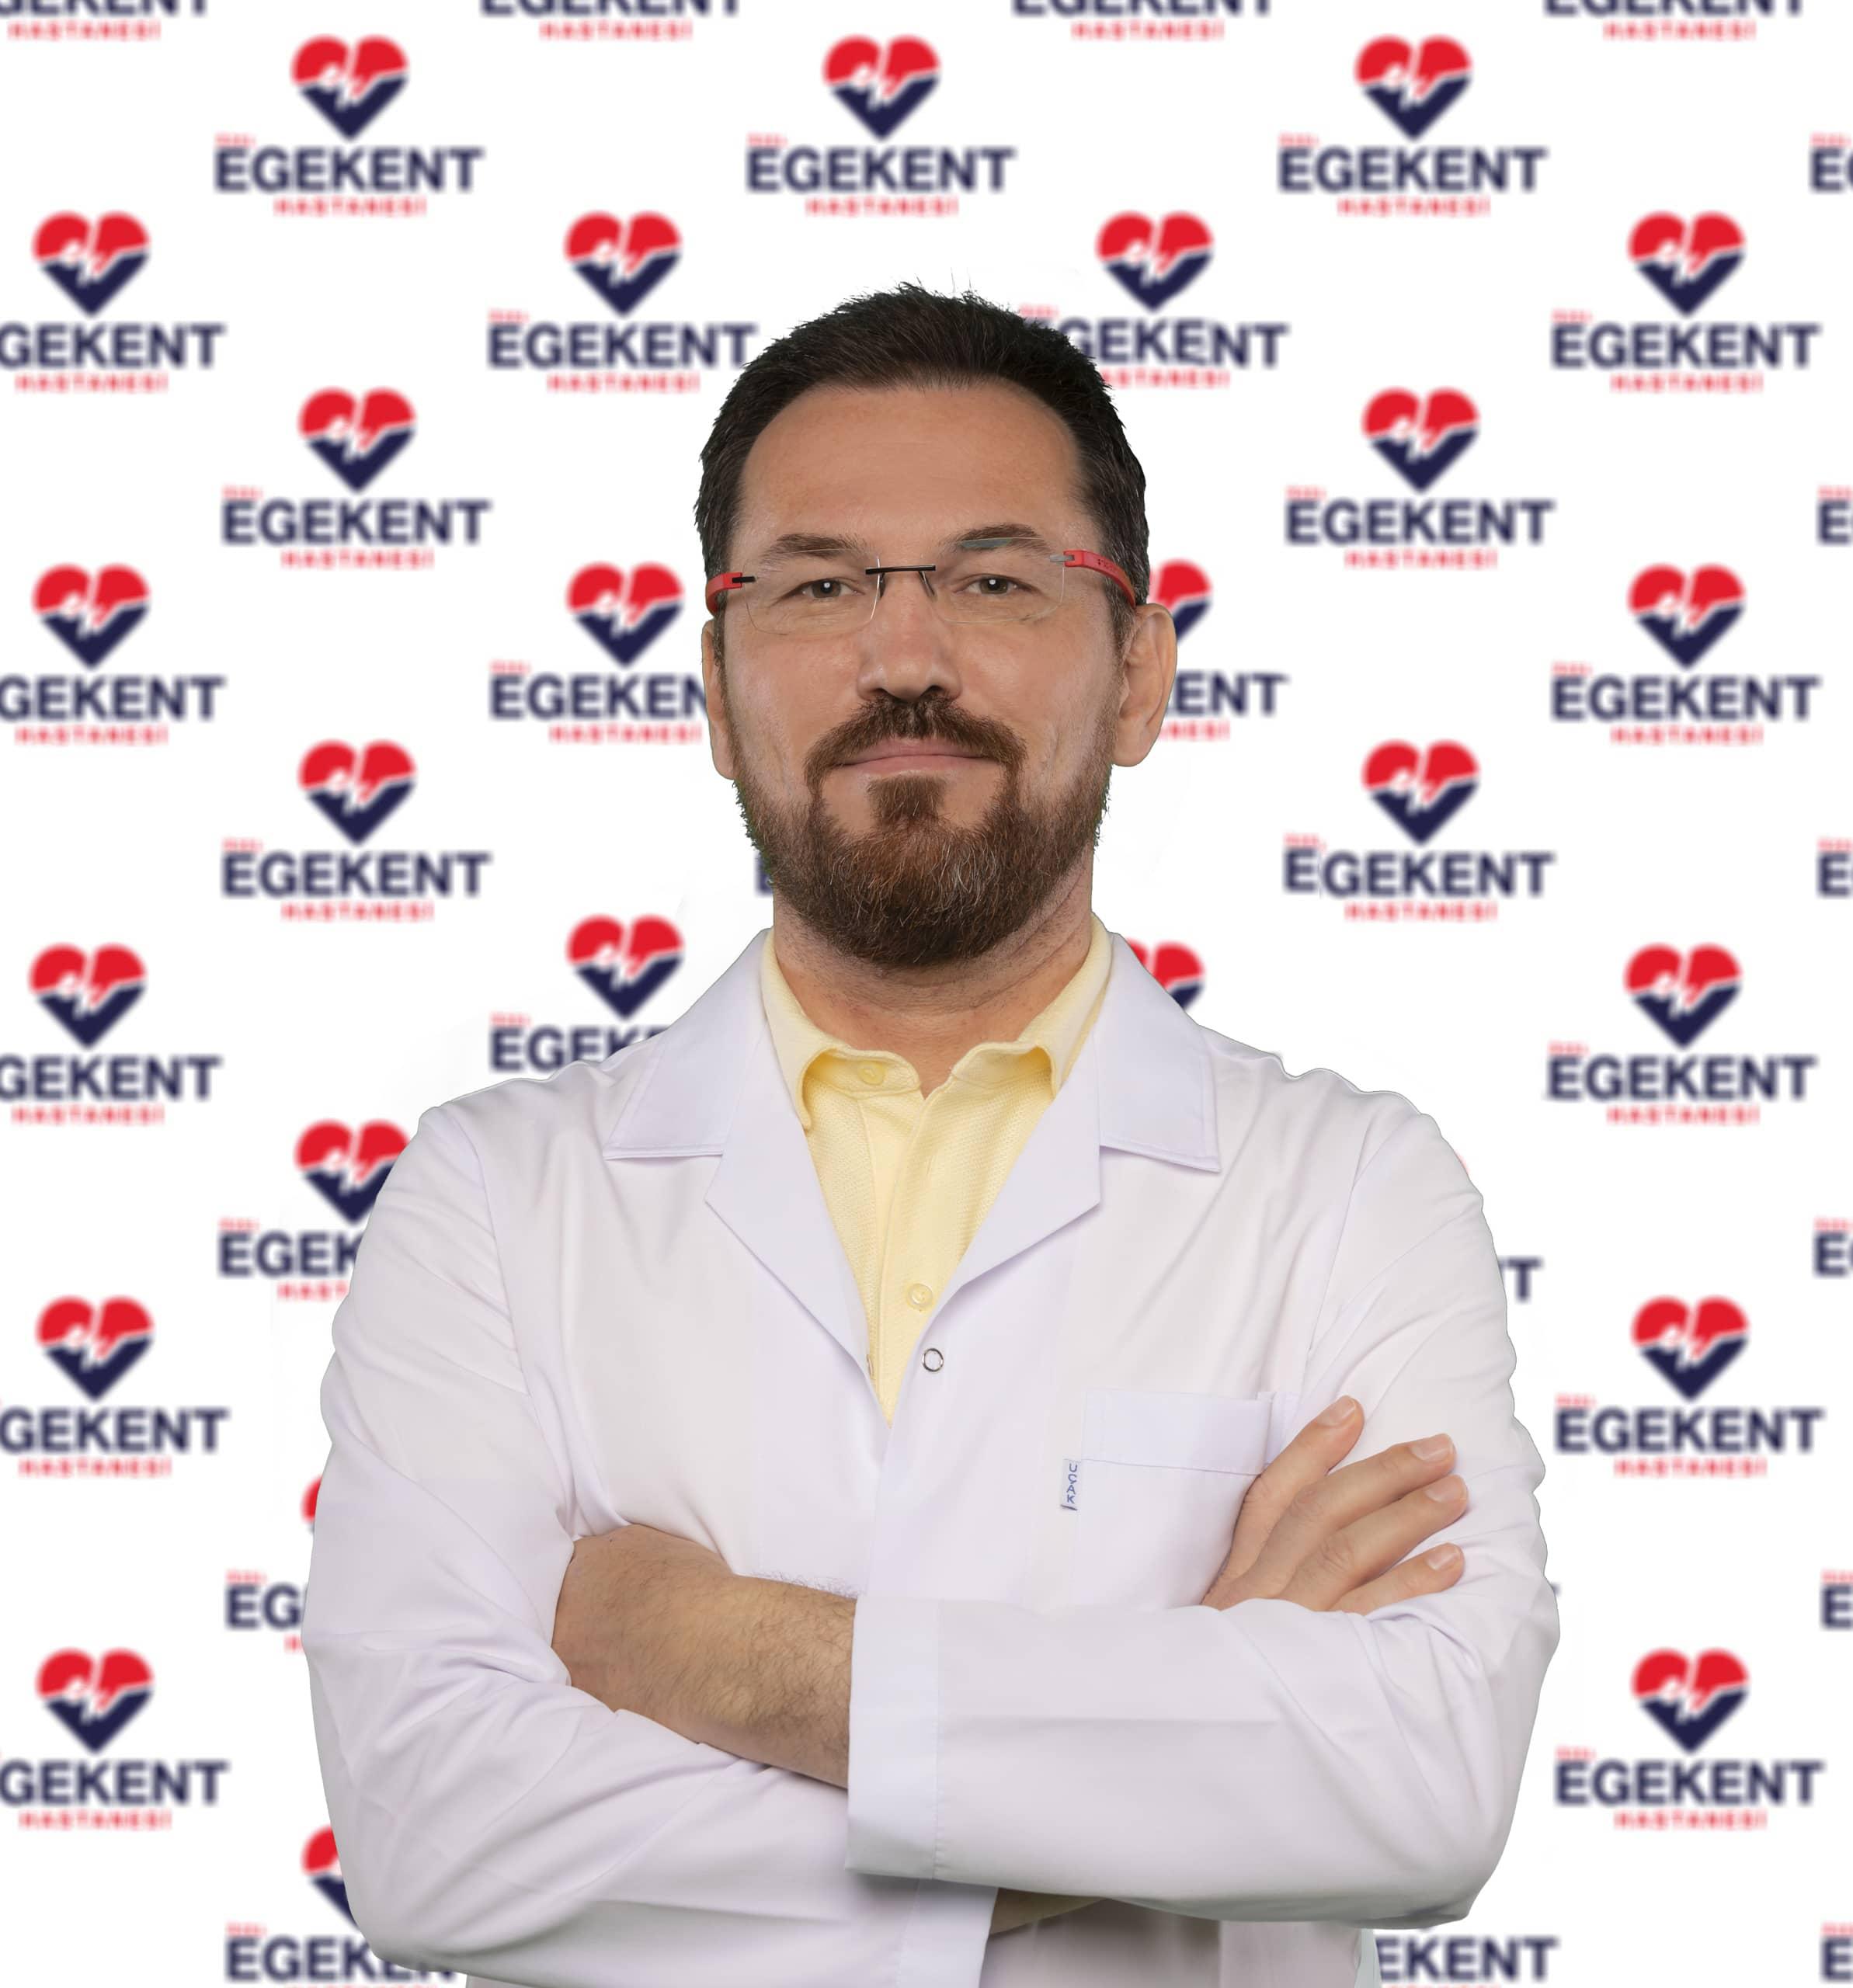 Uzm. Dr. Fatih ÇAM